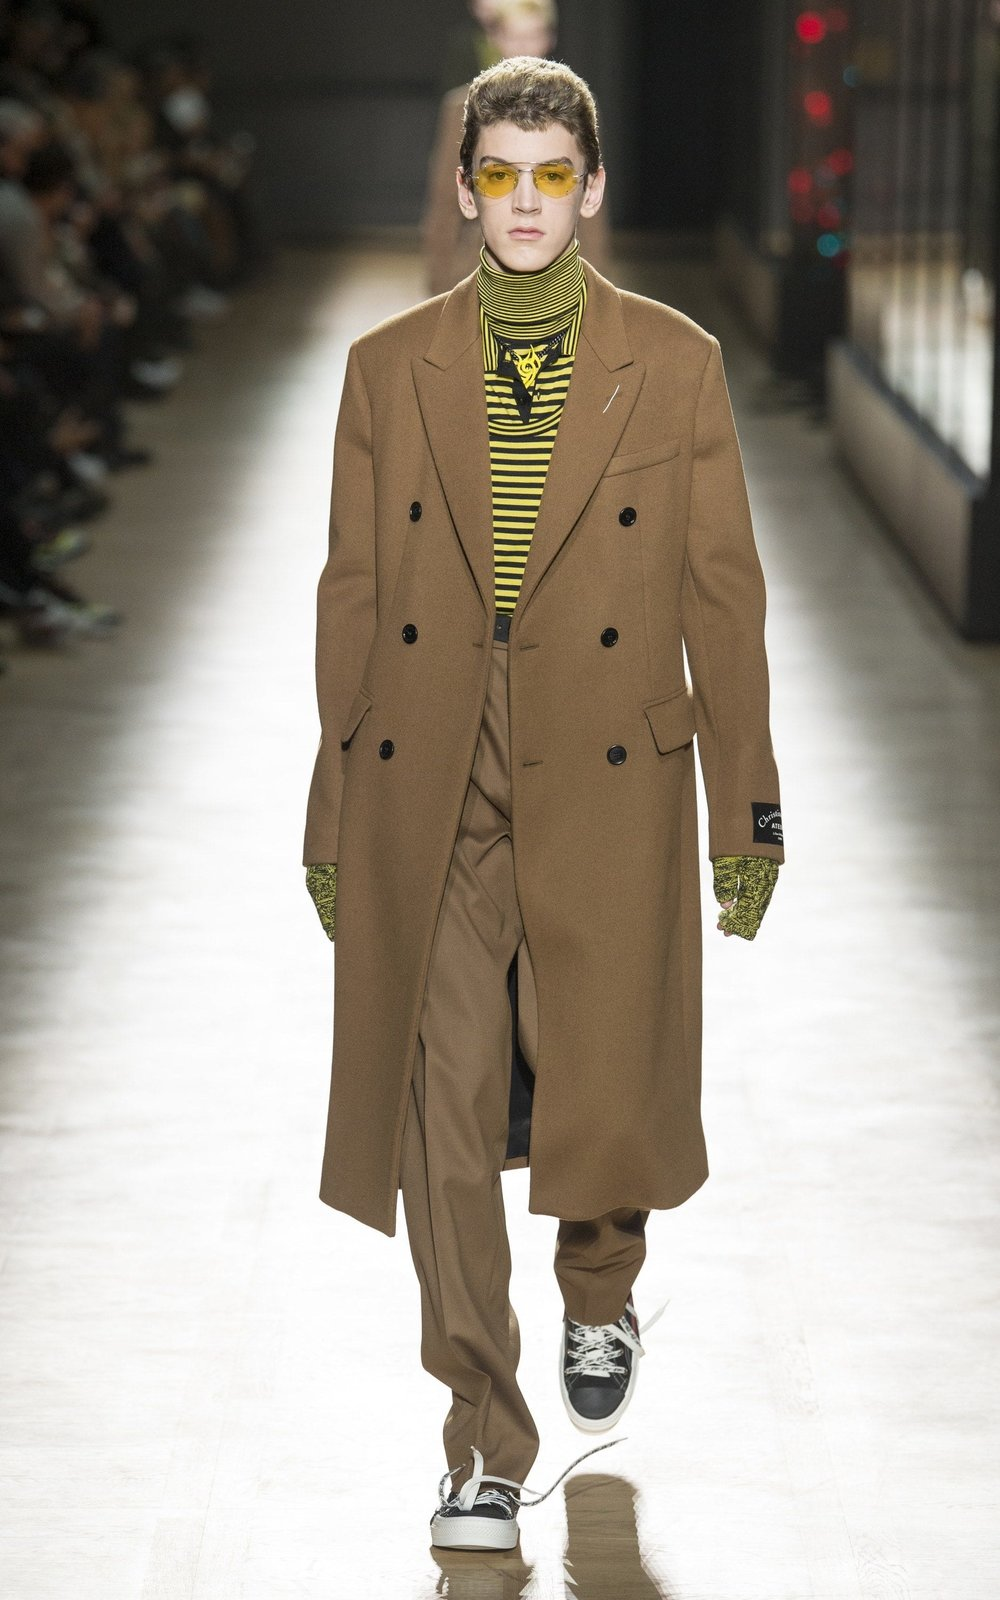 Image credit: Telegraph, Caption: Dior Homme